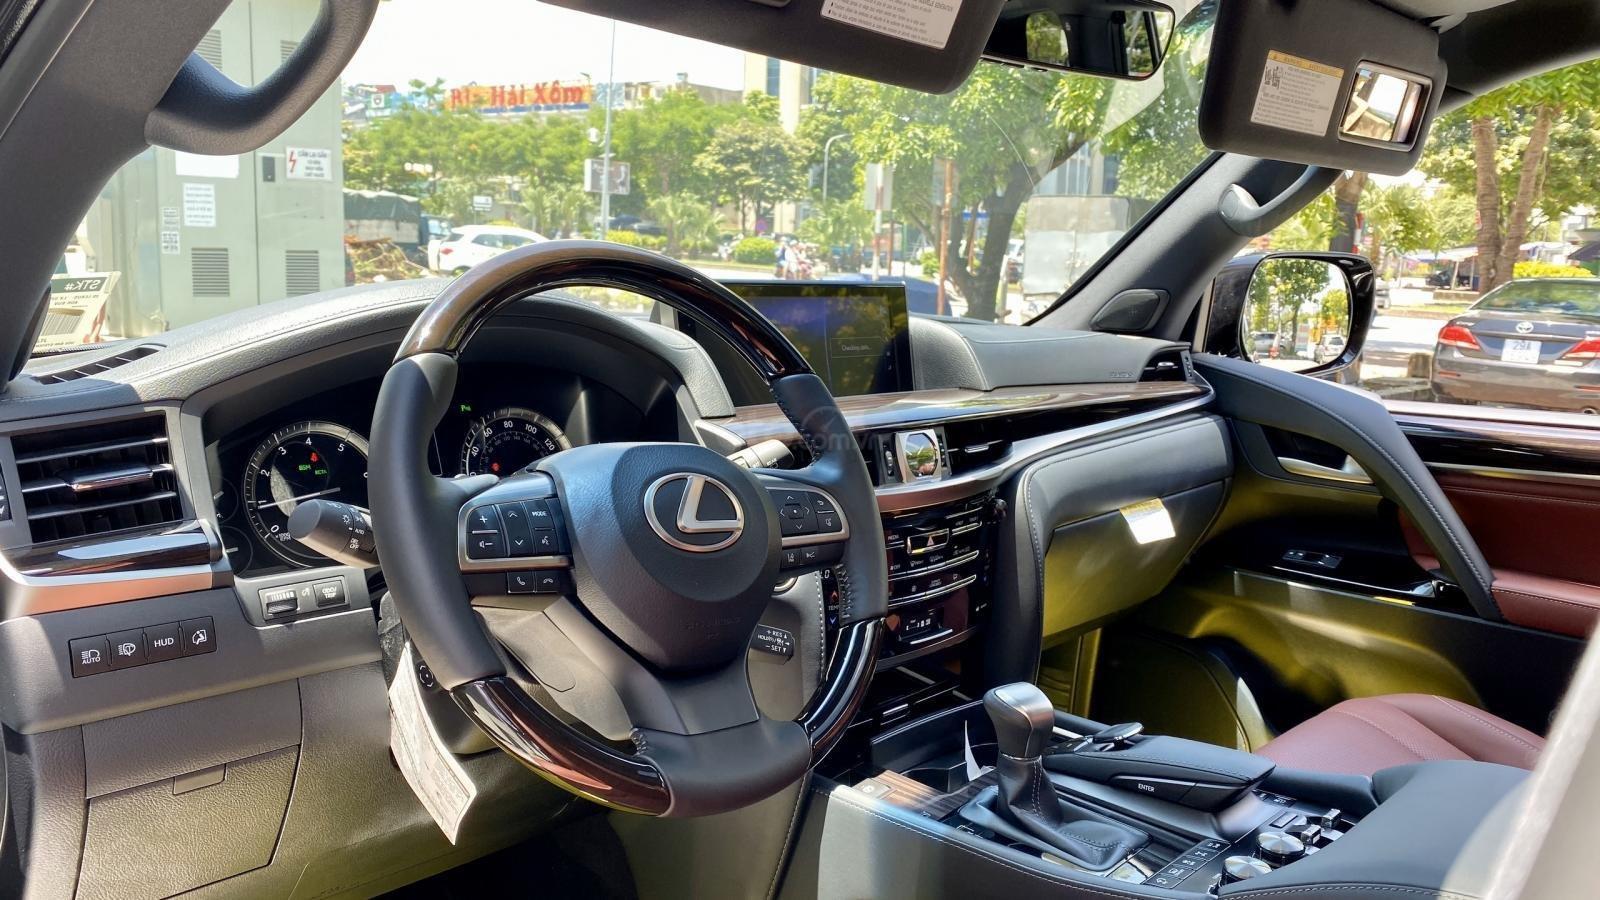 Bán Lexus LX 570s Supper Sport SX 2020, màu đen, xe nhập Mỹ mới 100% (8)